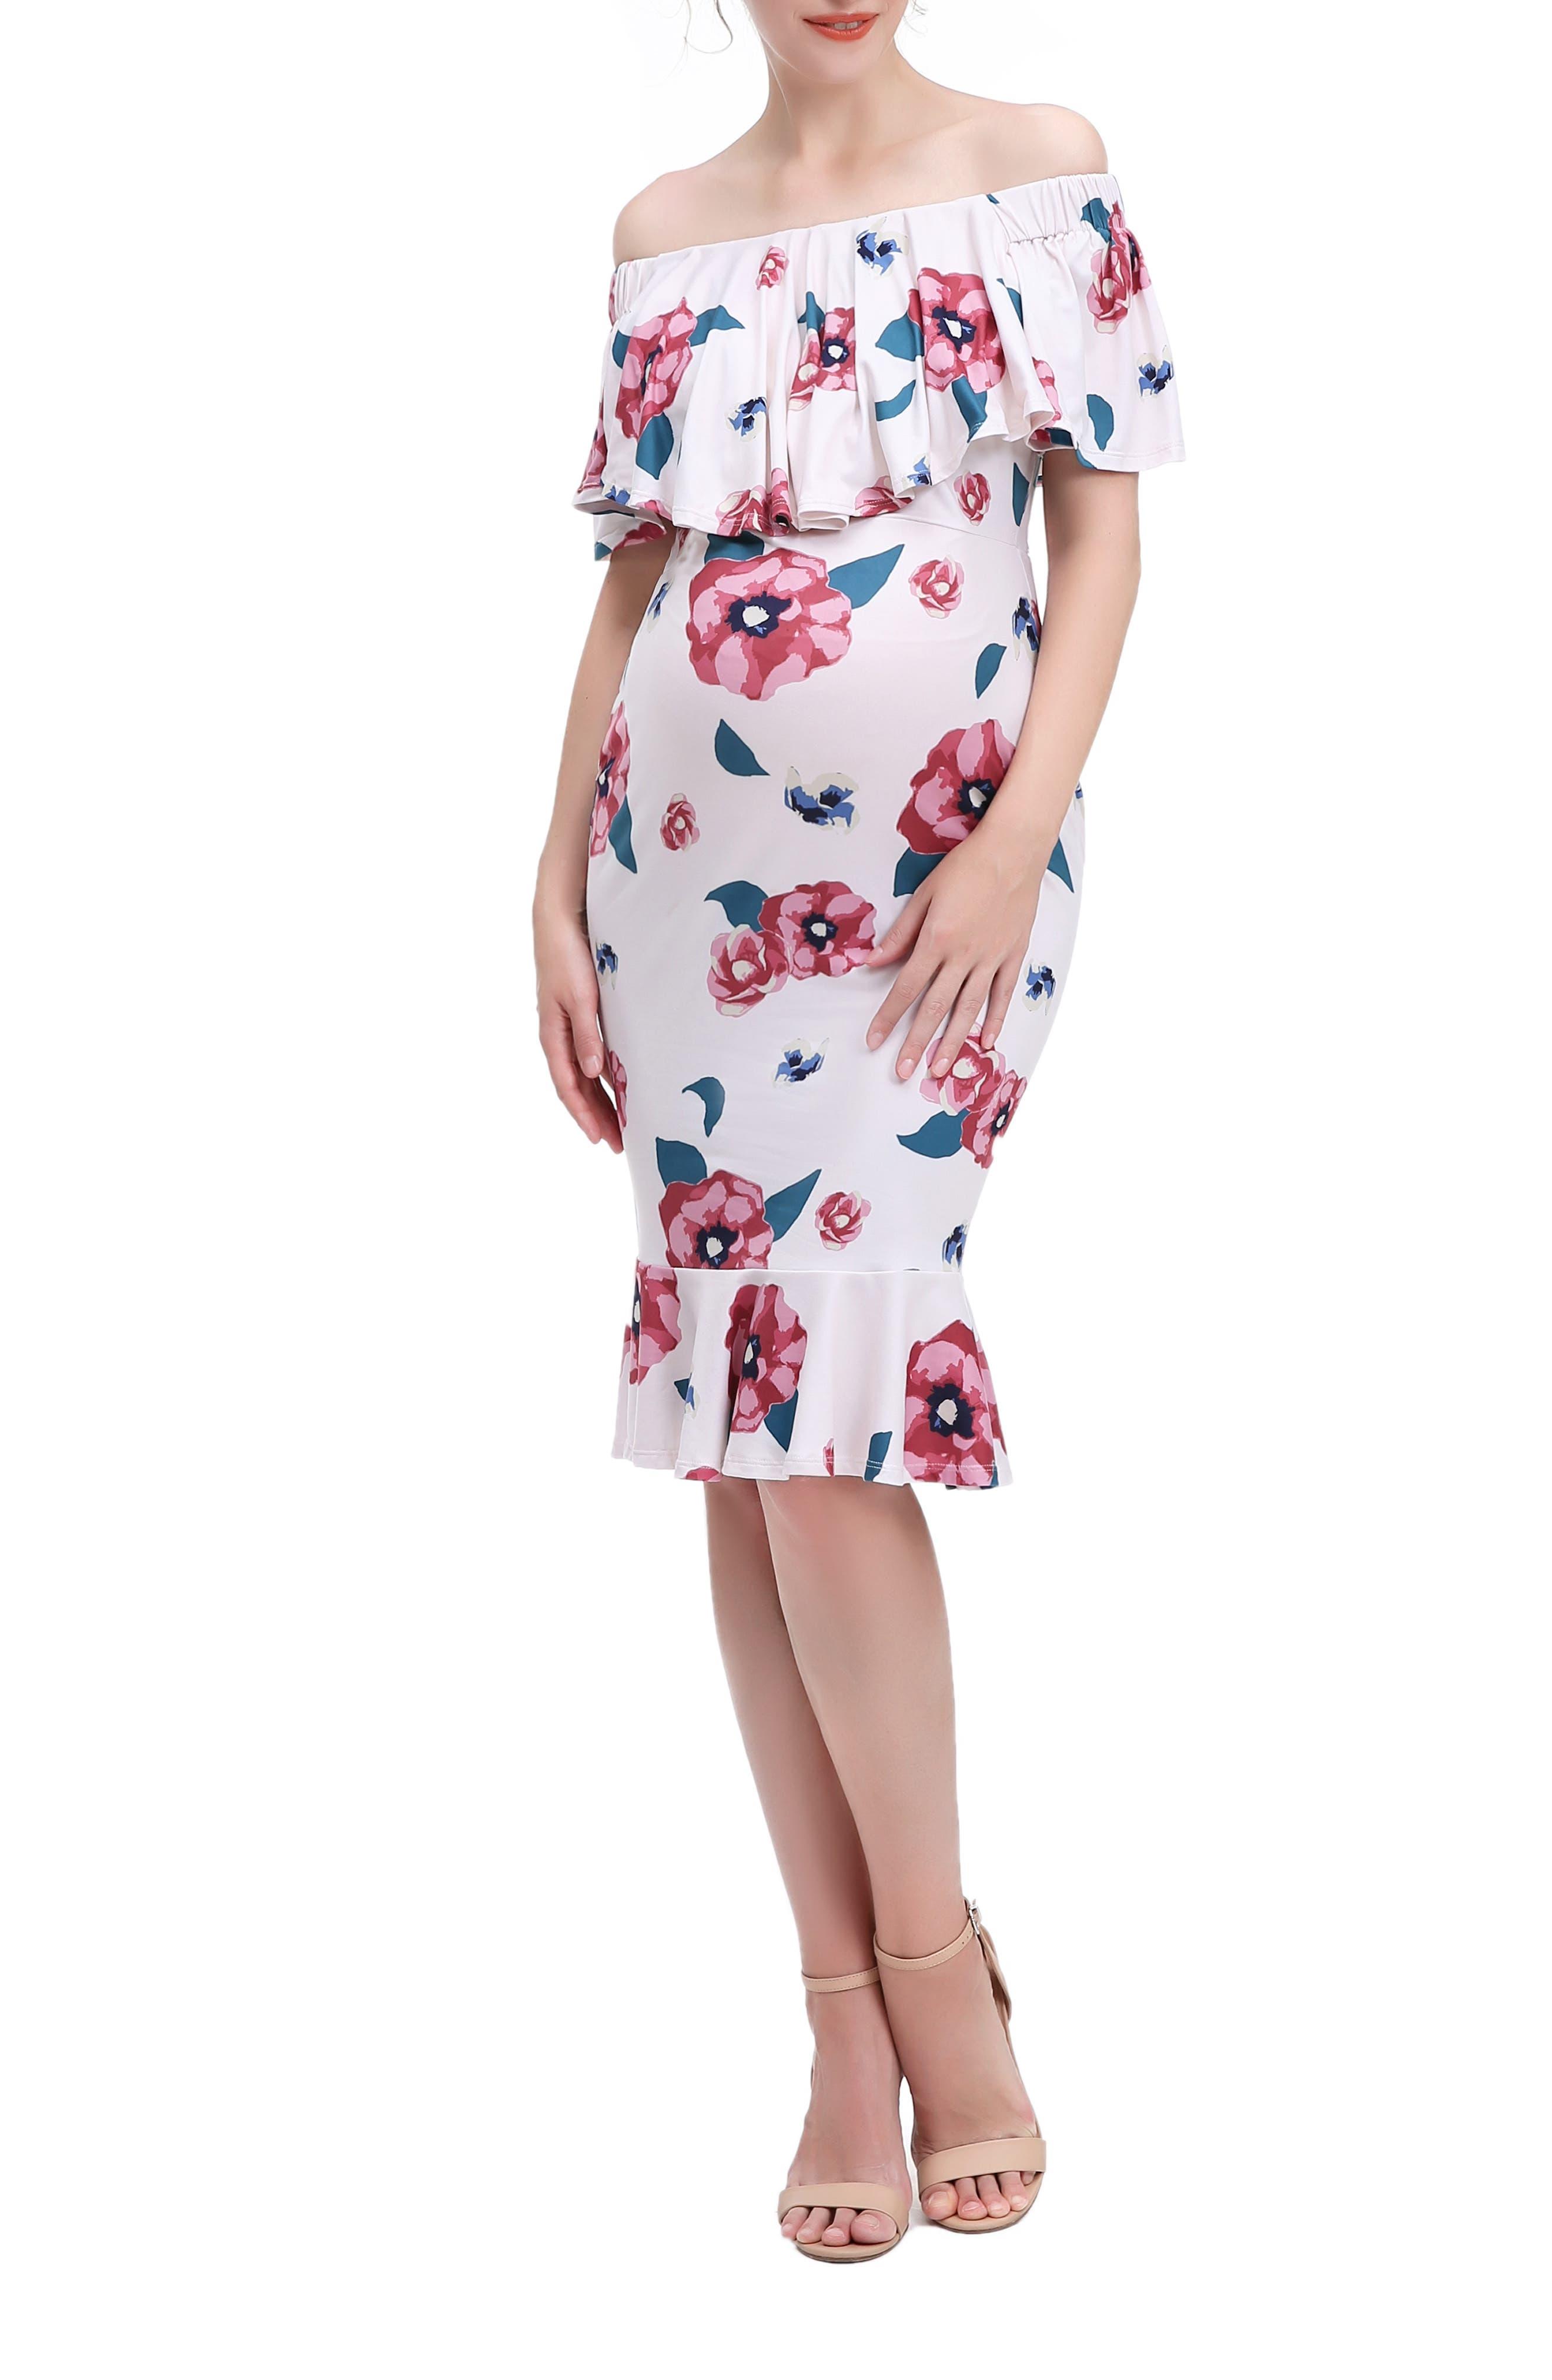 Kyla Floral Mermaid Hem Maternity/nursing Dress